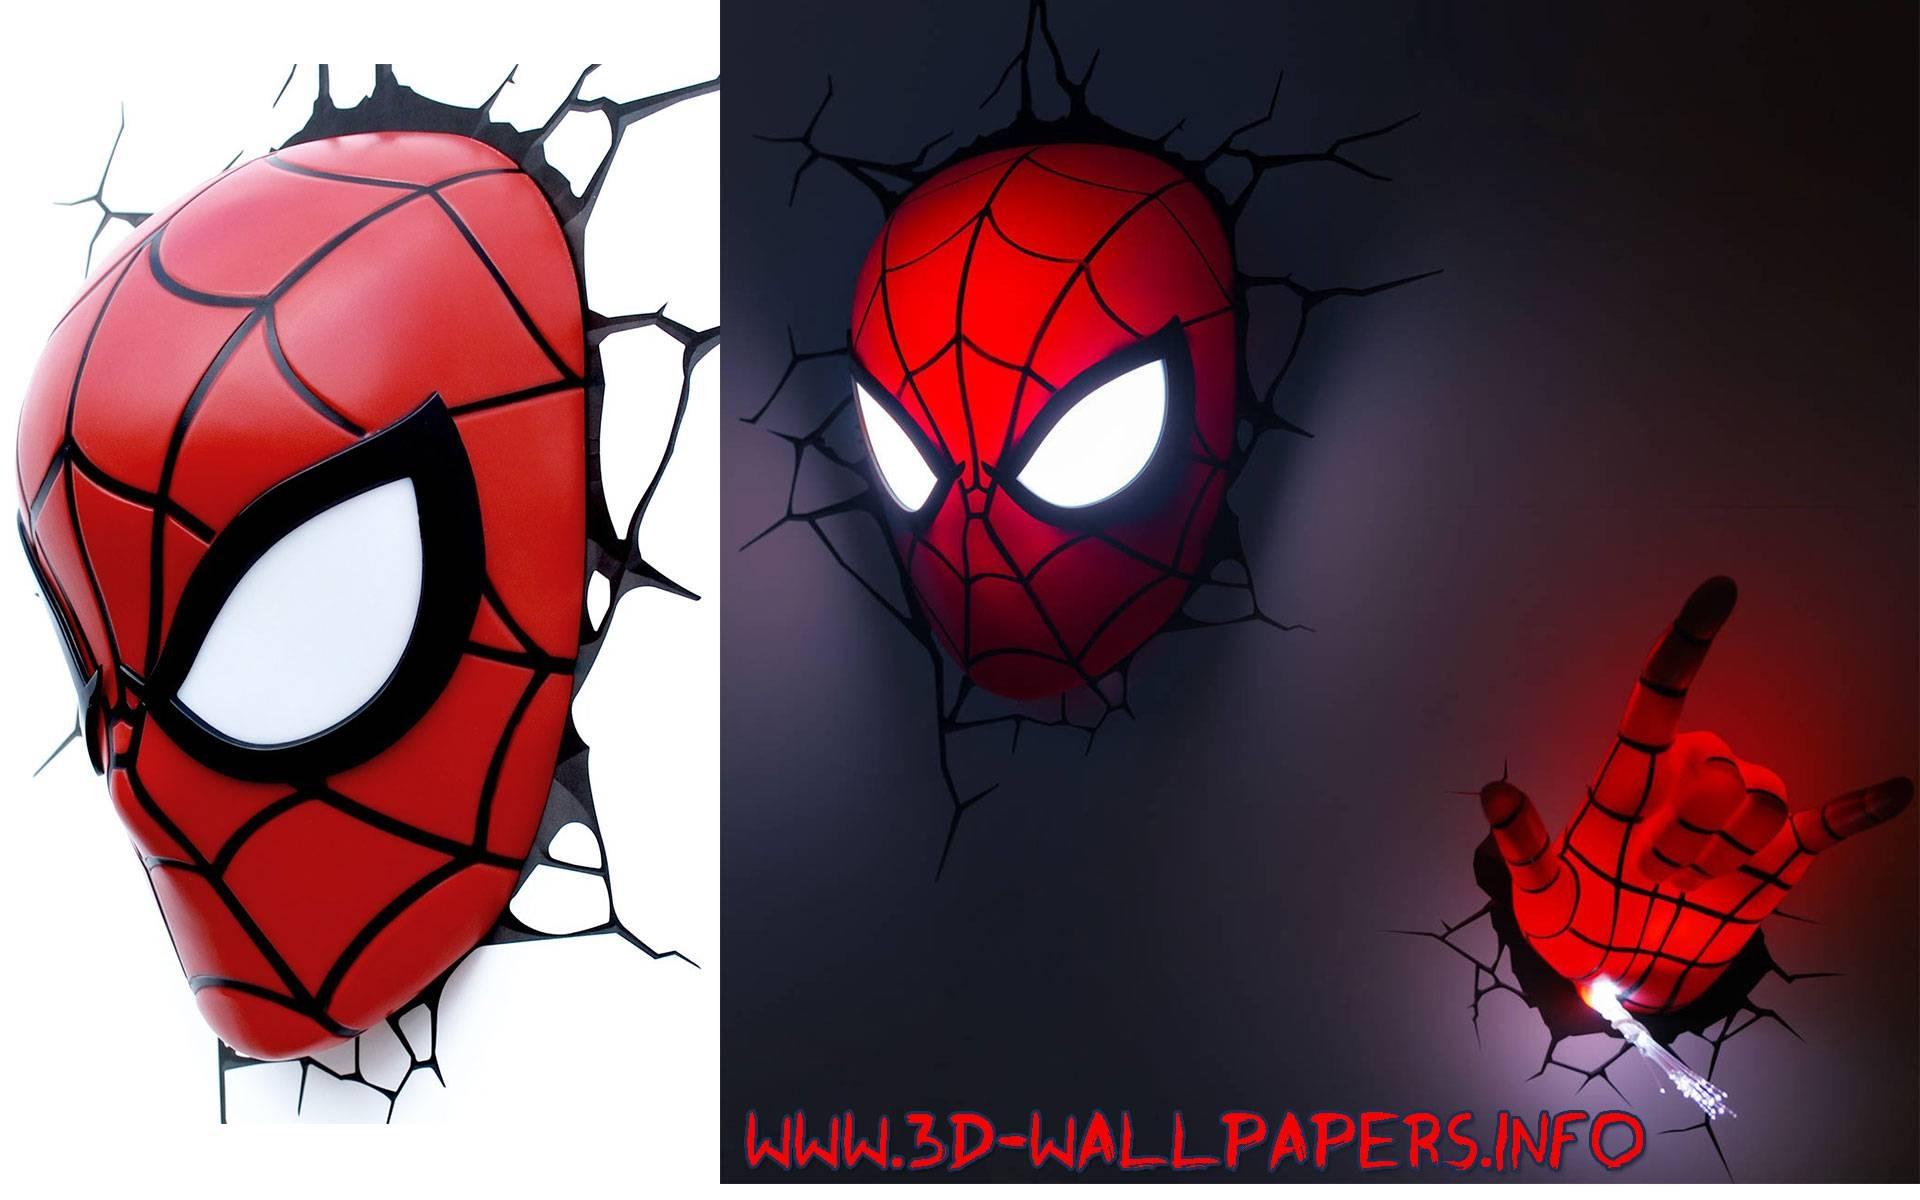 3D Wall Art Nightlight Spiderman Hand | Wallartideas Throughout Most Popular 3D Wall Art With Lights (View 3 of 20)